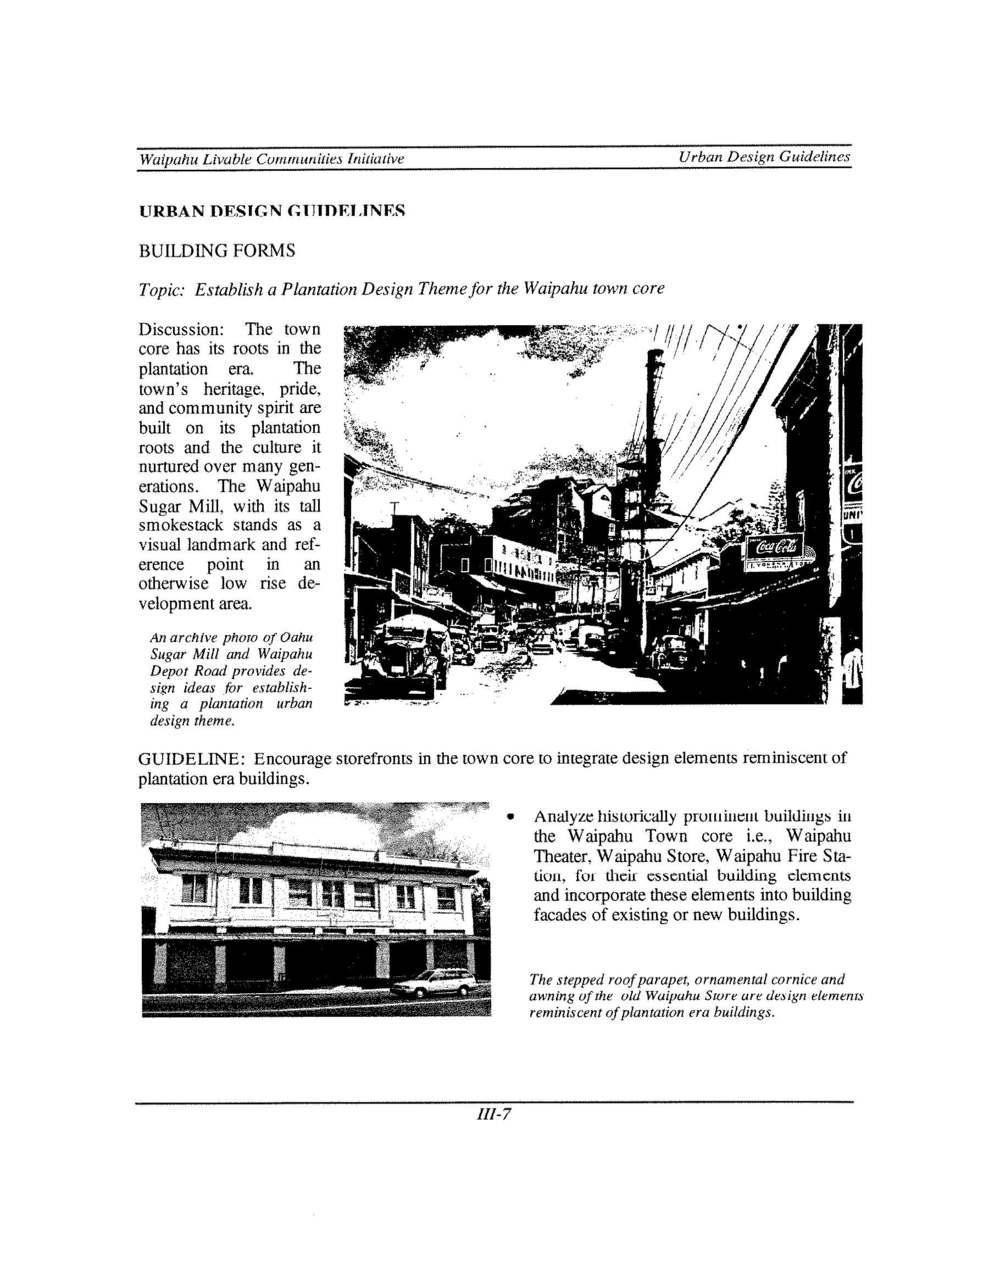 160531_WaipahuLivableCommunities(1998)_Page_097.jpg